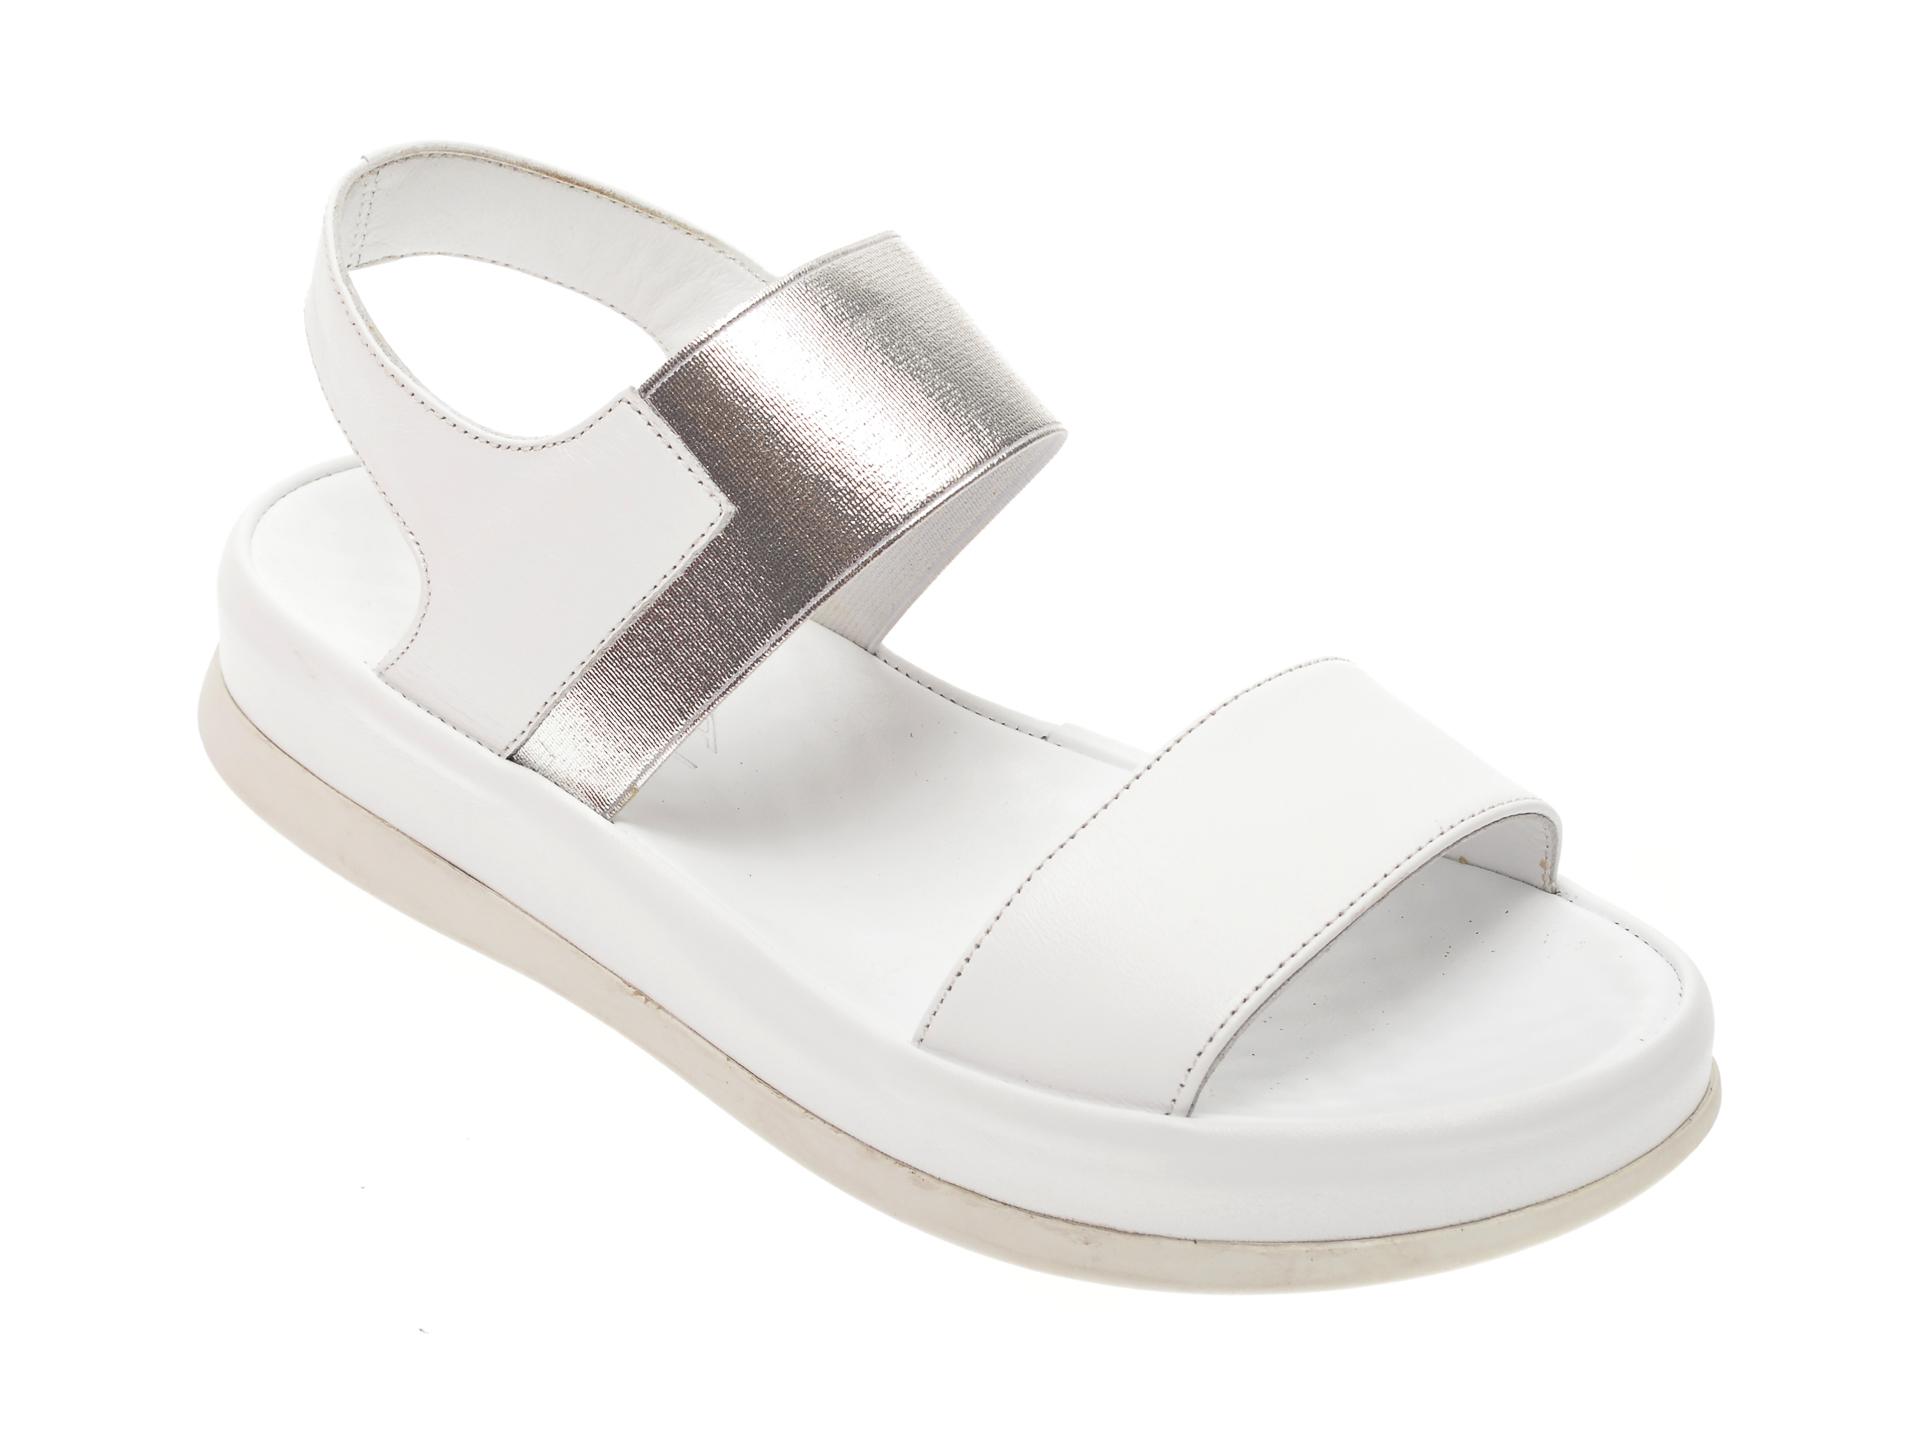 Sandale MISS LIZA albe, 118PD02, din piele naturala